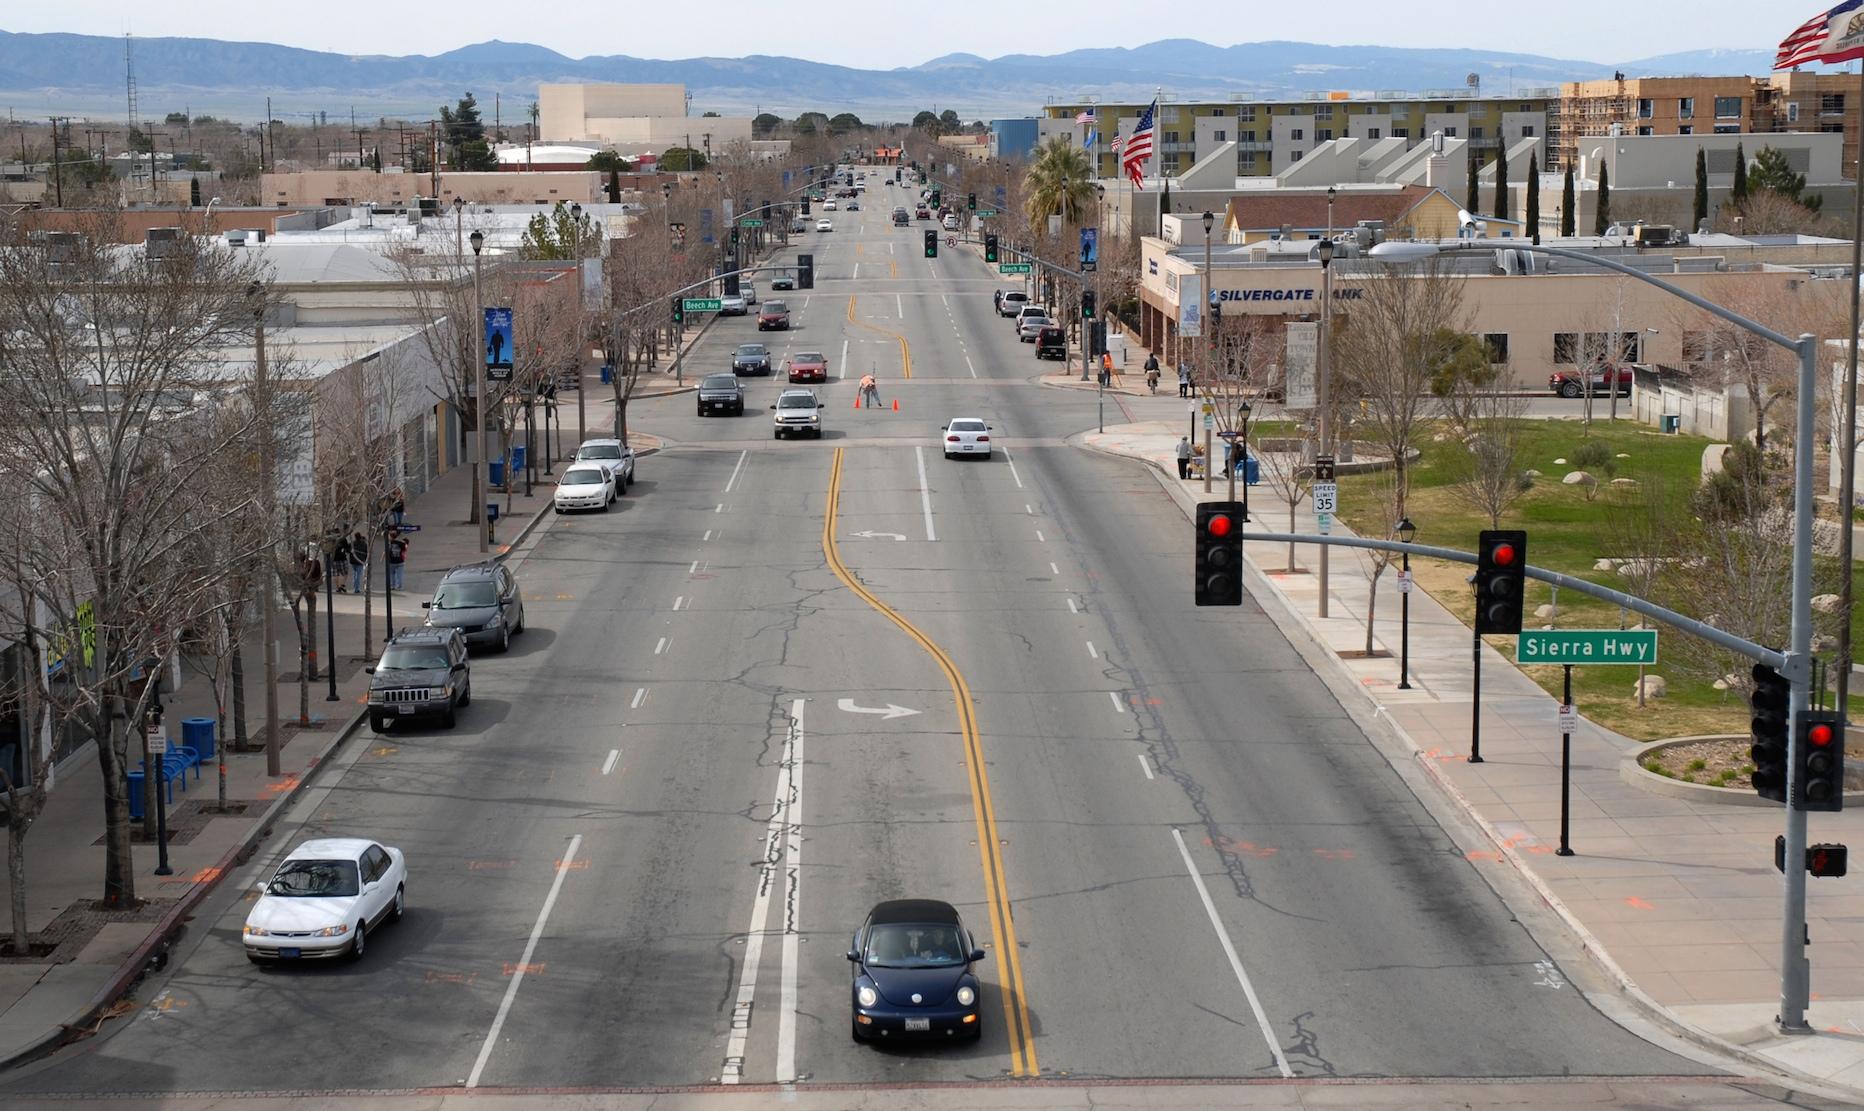 Highway 14, Lancaster, California. Existing conditions circa 2008.